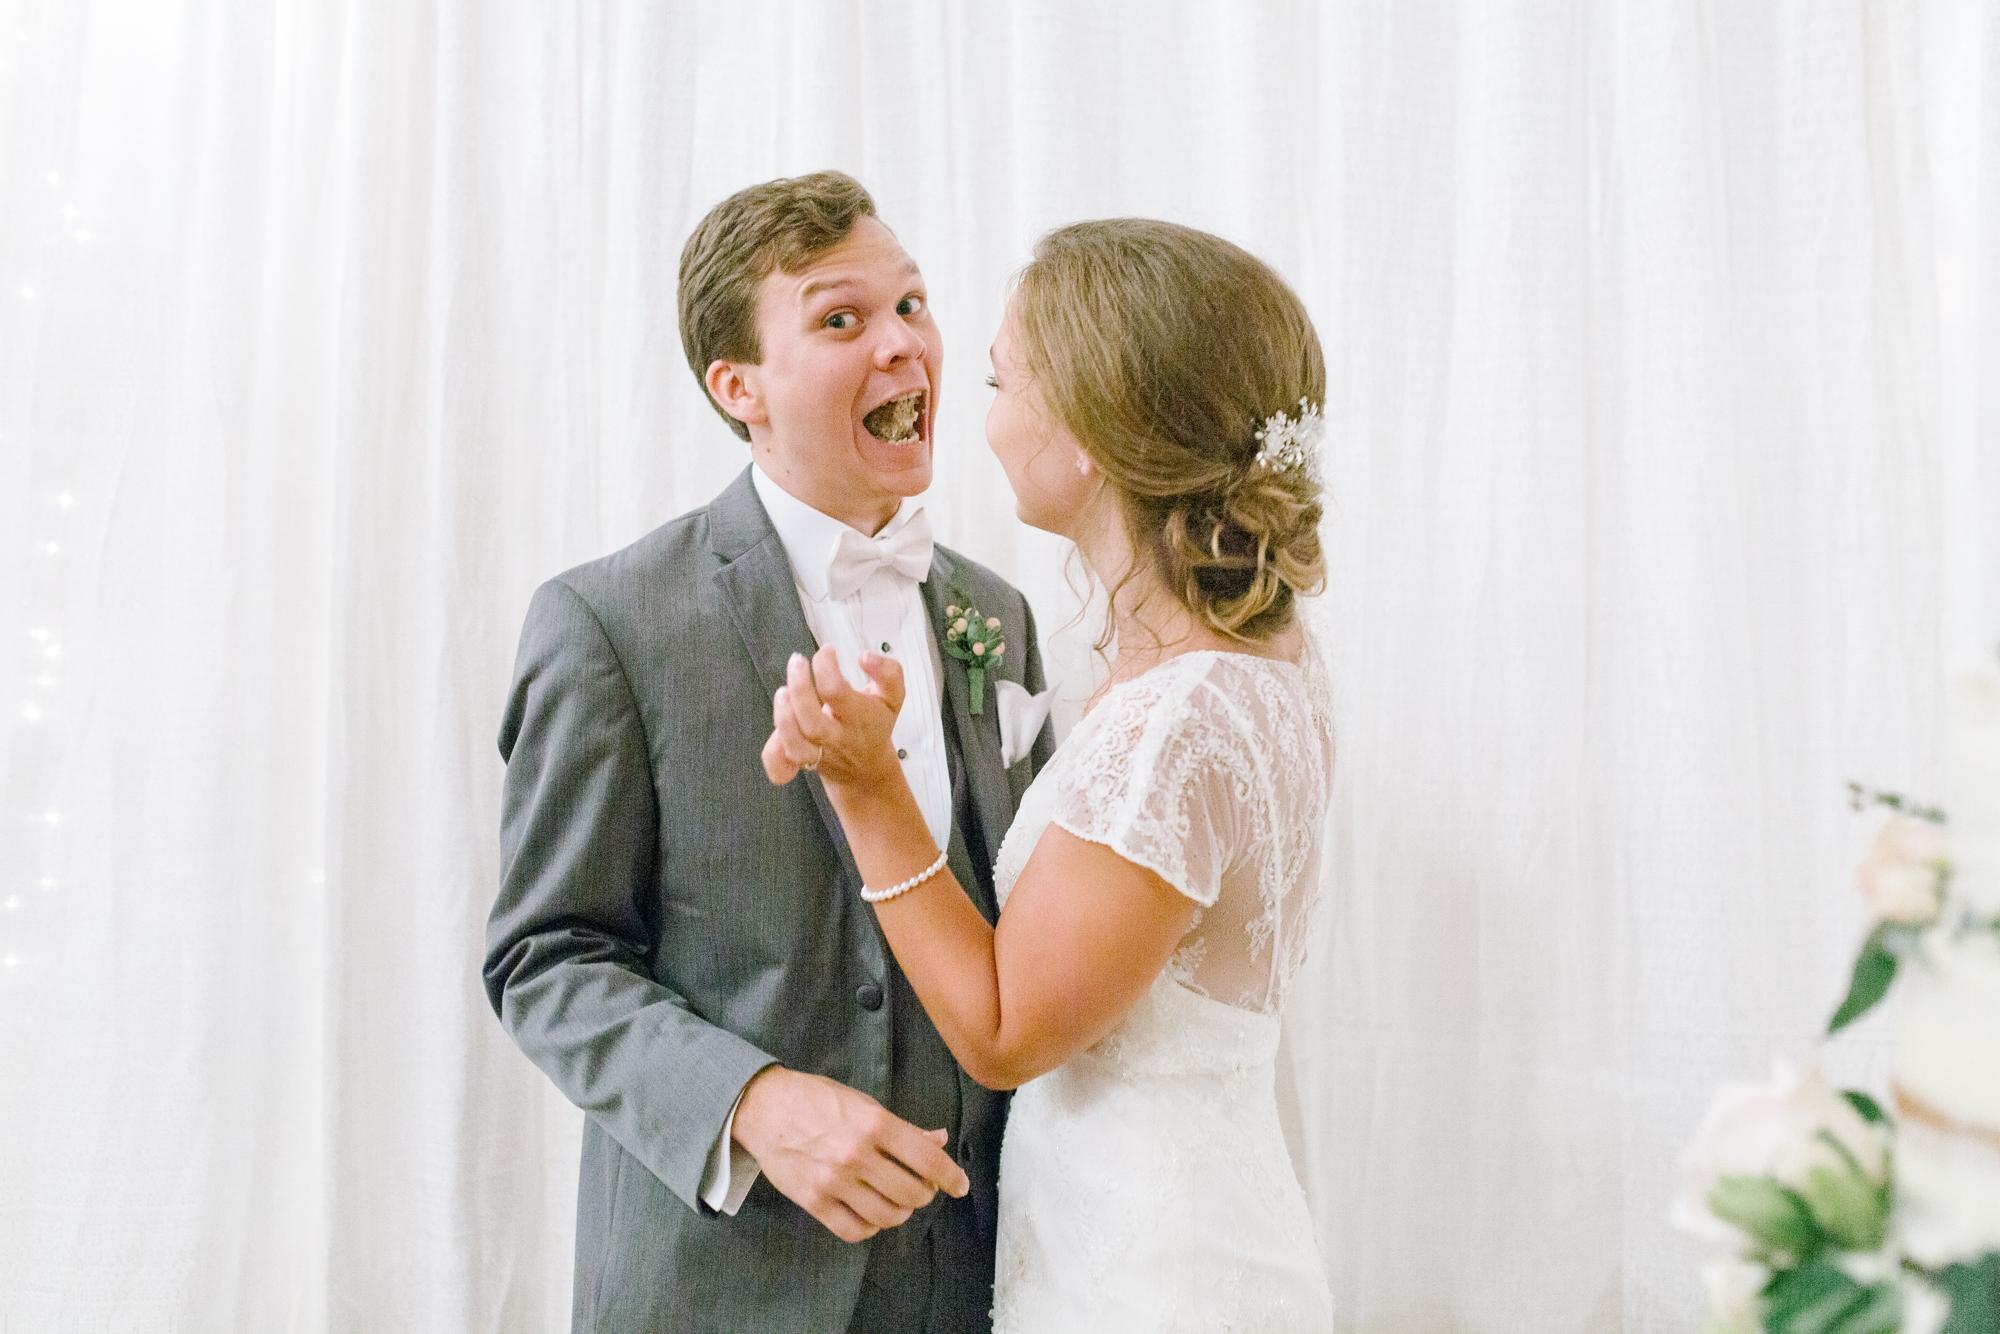 New_Orleans_Wedding_Photographer_1735.jpg